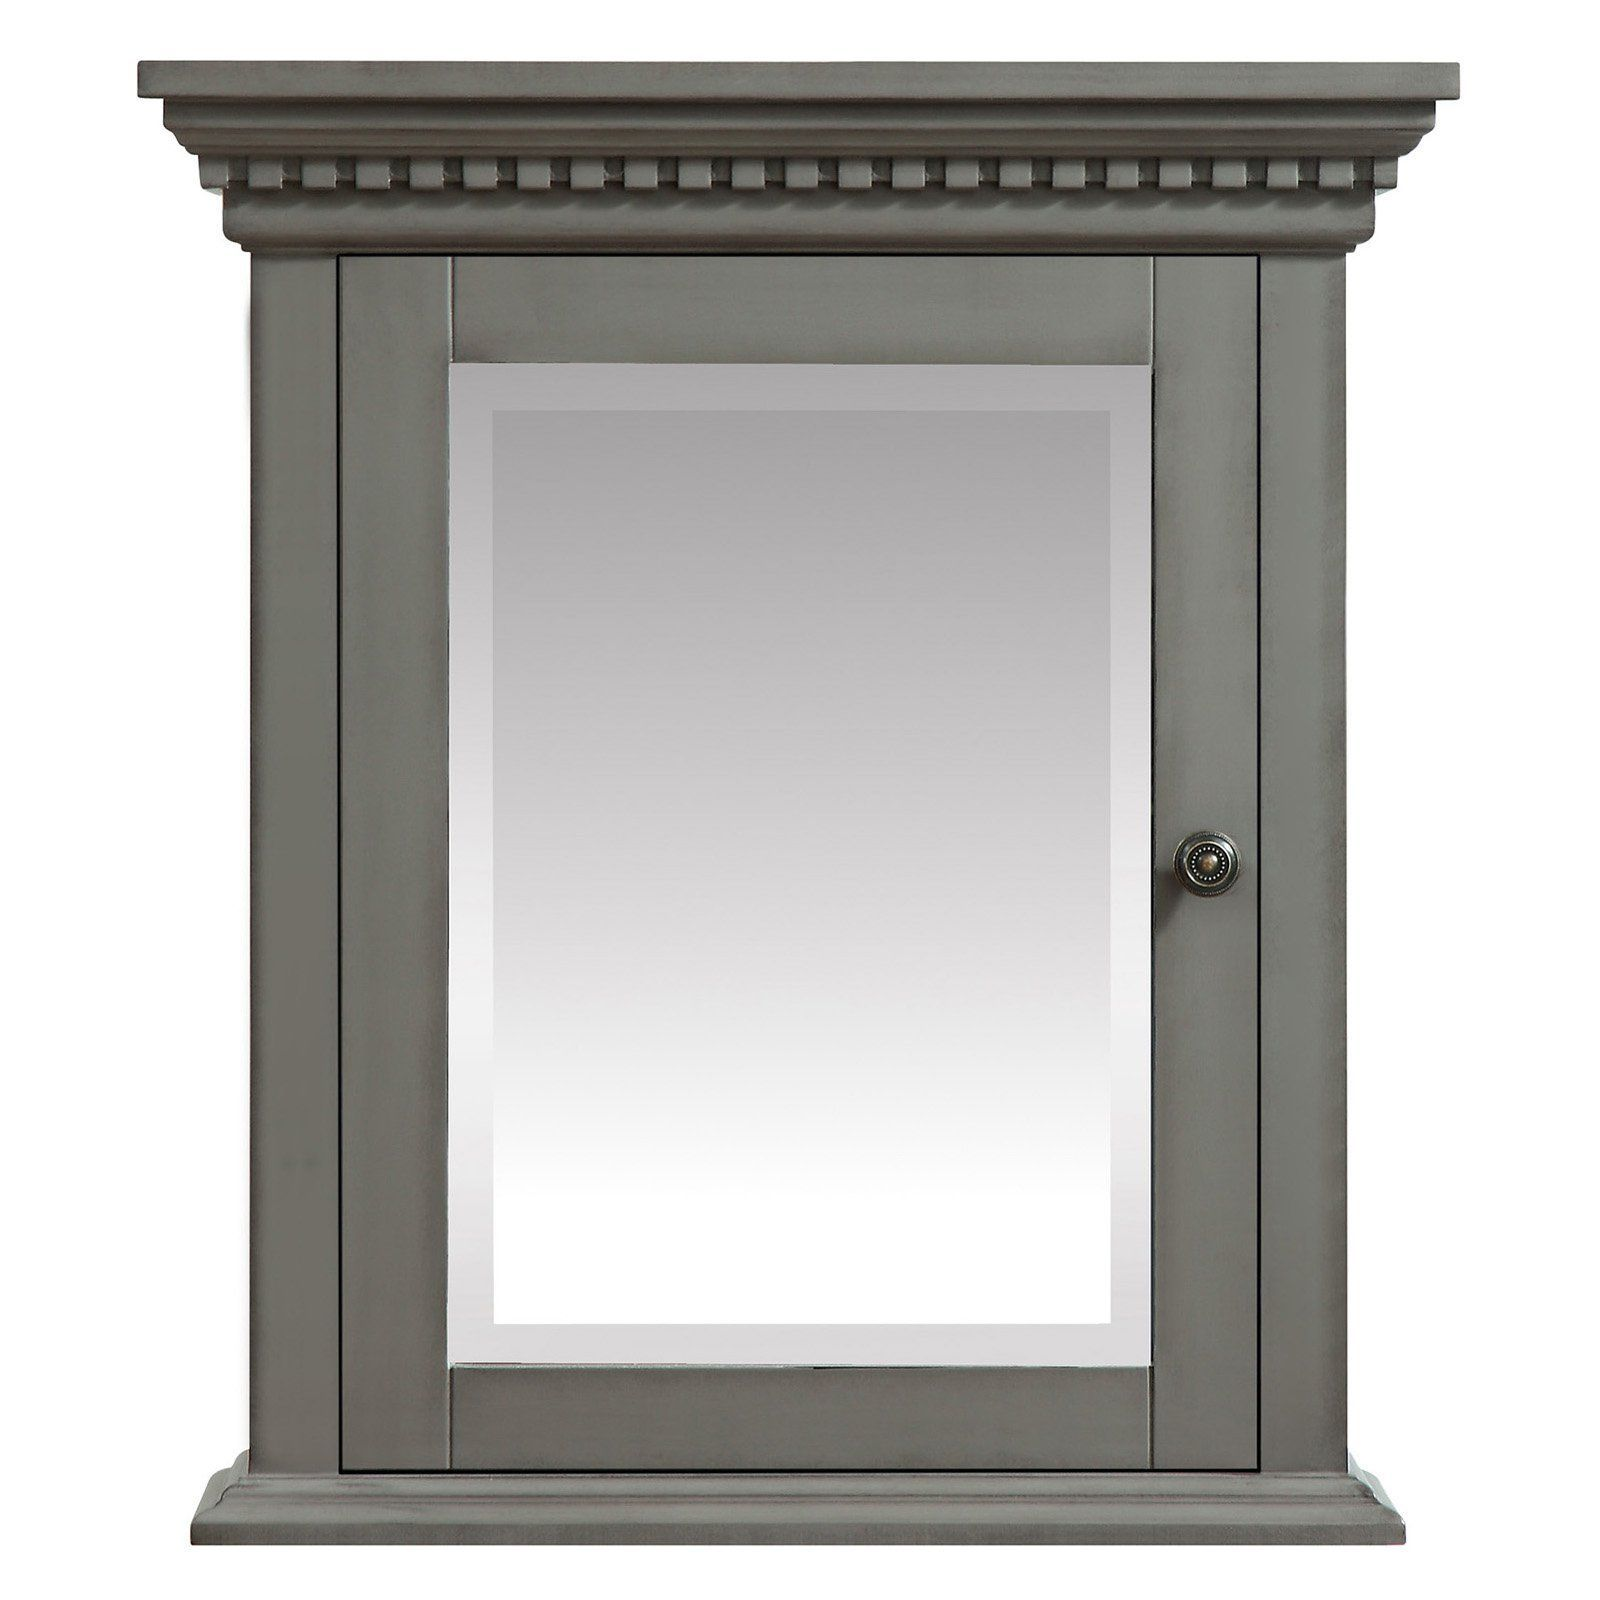 Azzuri Hastings 24 in. Mirror Cabinet - HASTINGS-MC24-FG